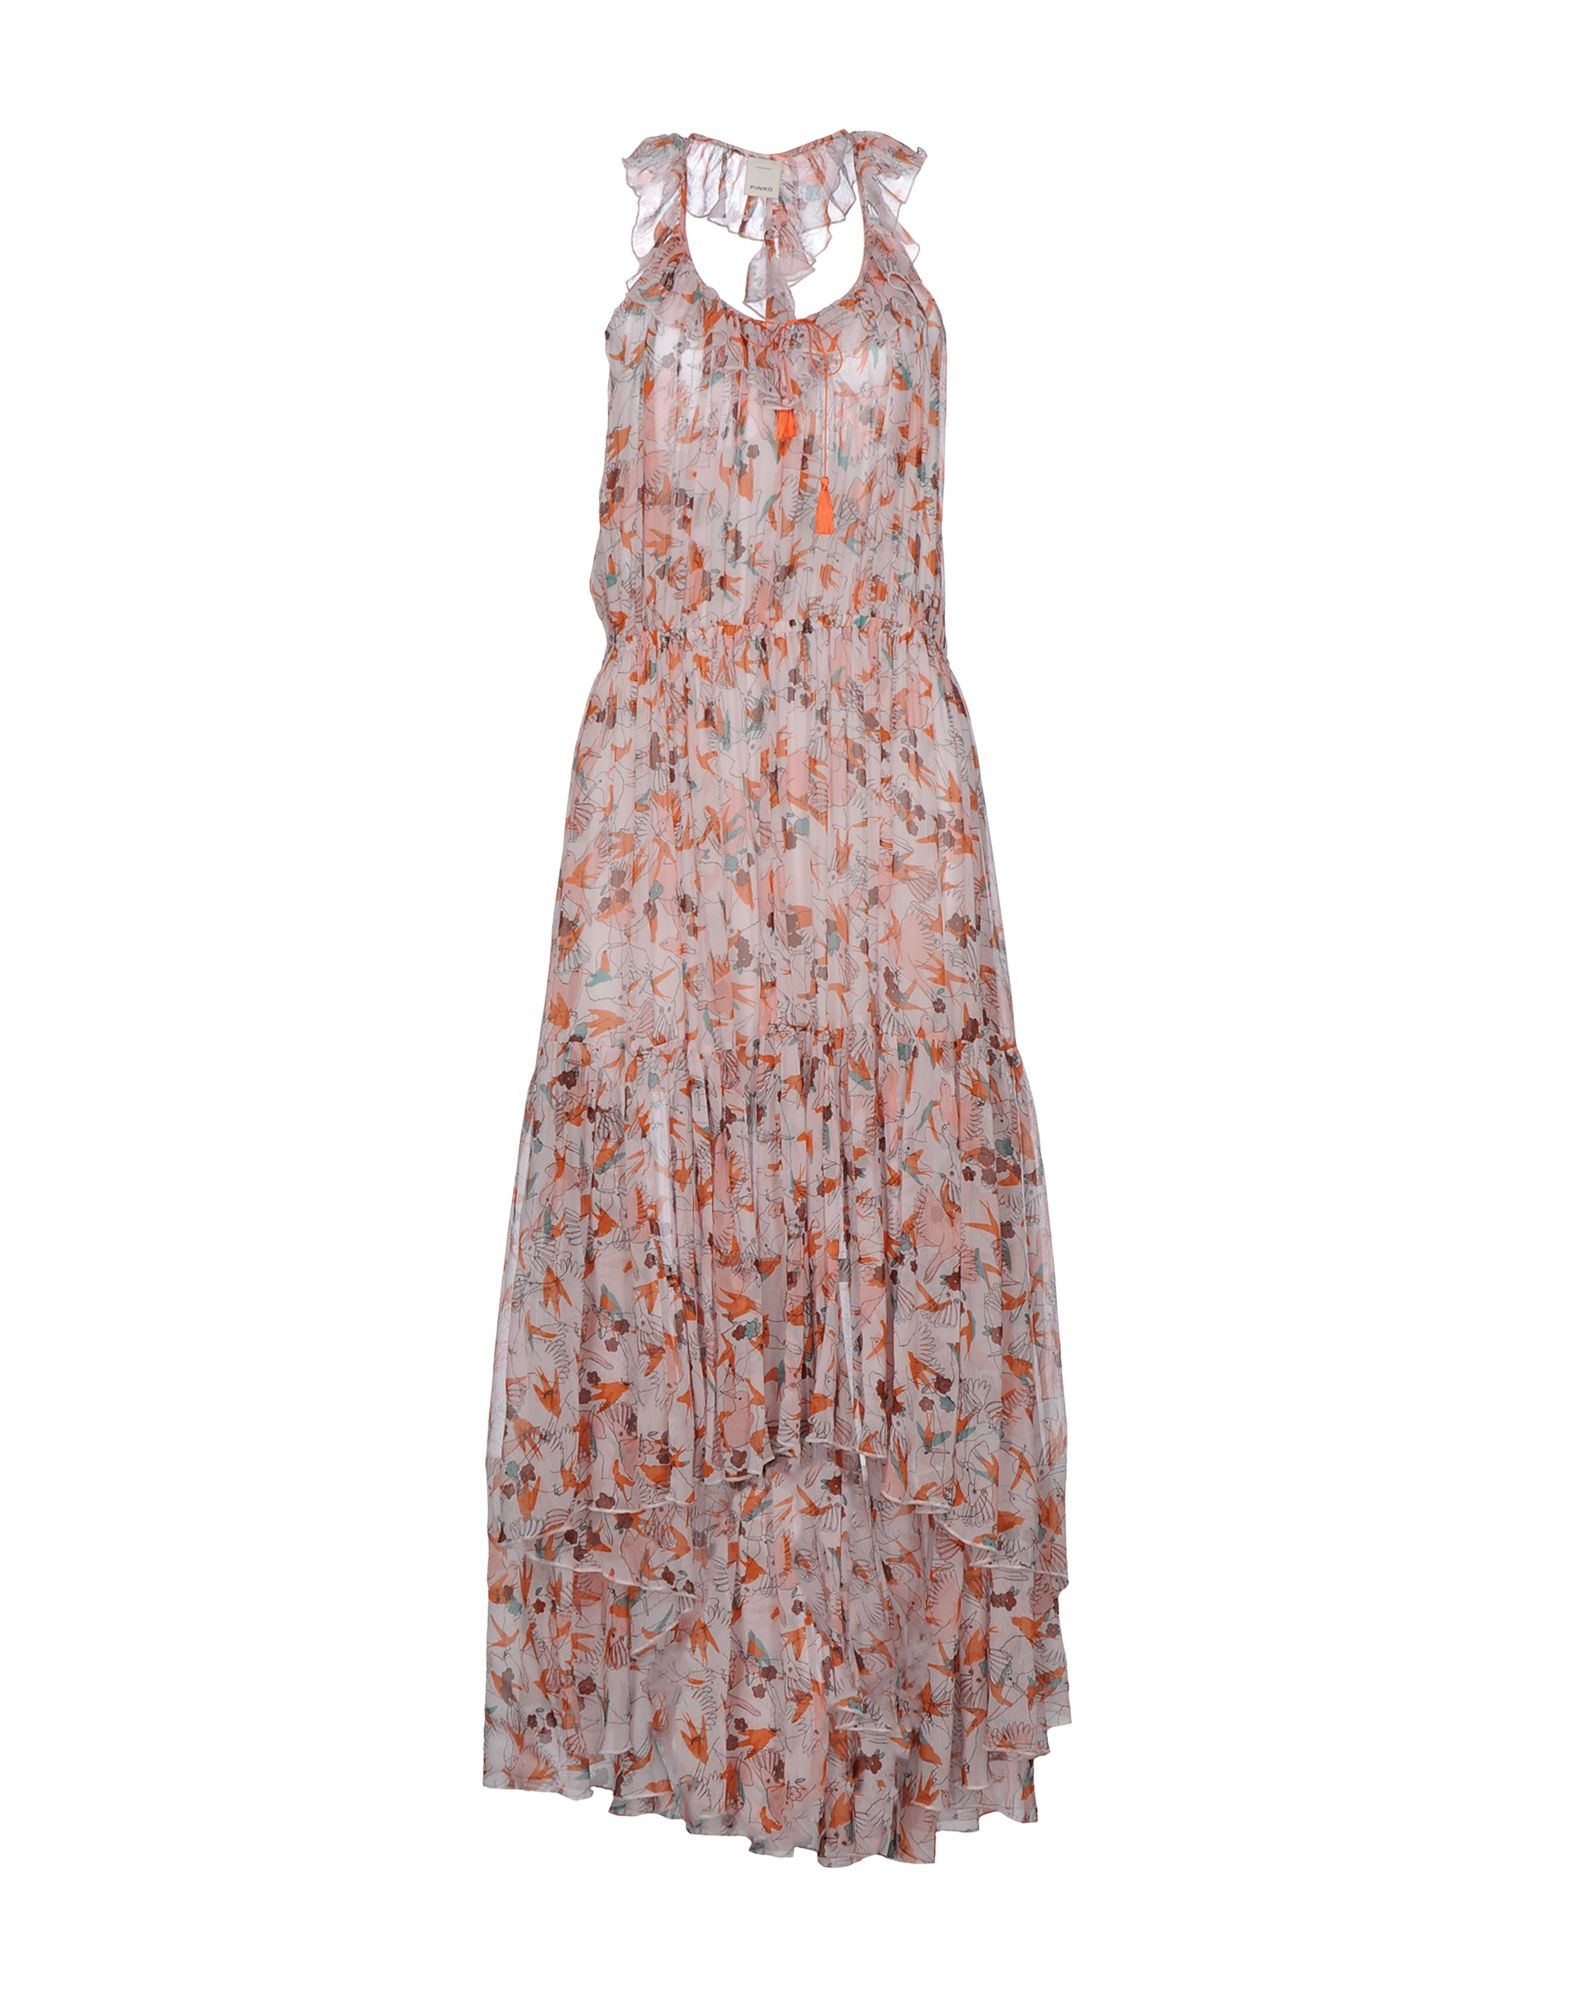 PINKO Платье длиной 3/4 3 3 300 30000